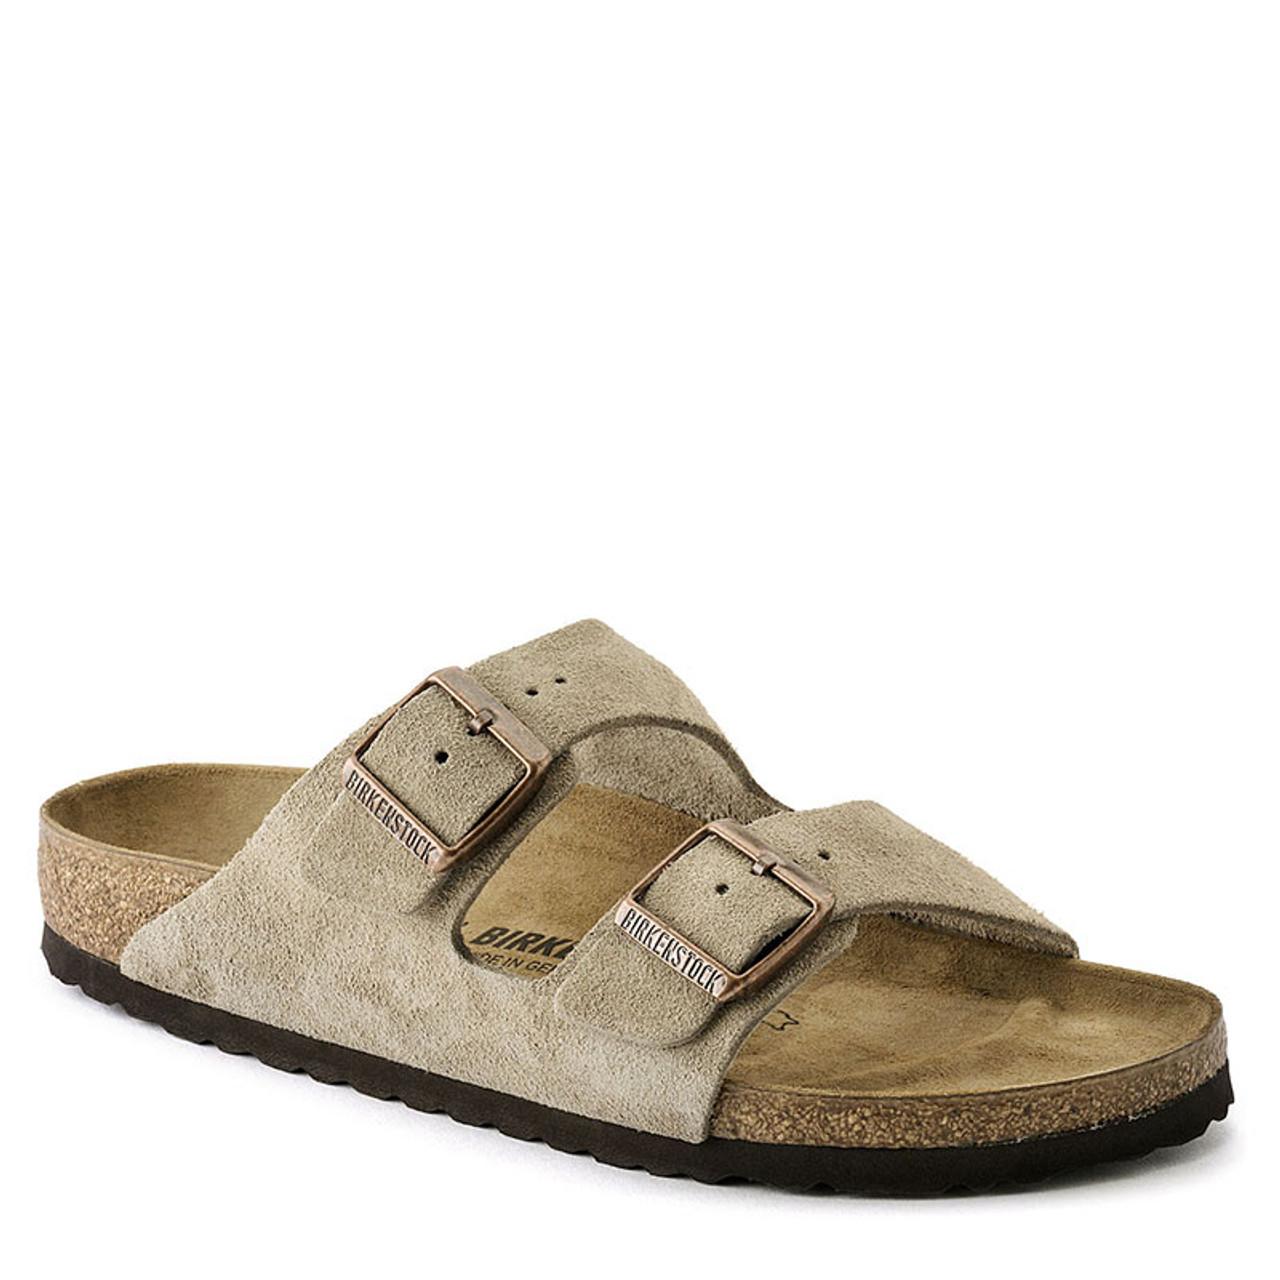 2d2f89cd5cc Birkenstock Men s Arizona Taupe Sandals - Family Footwear Center